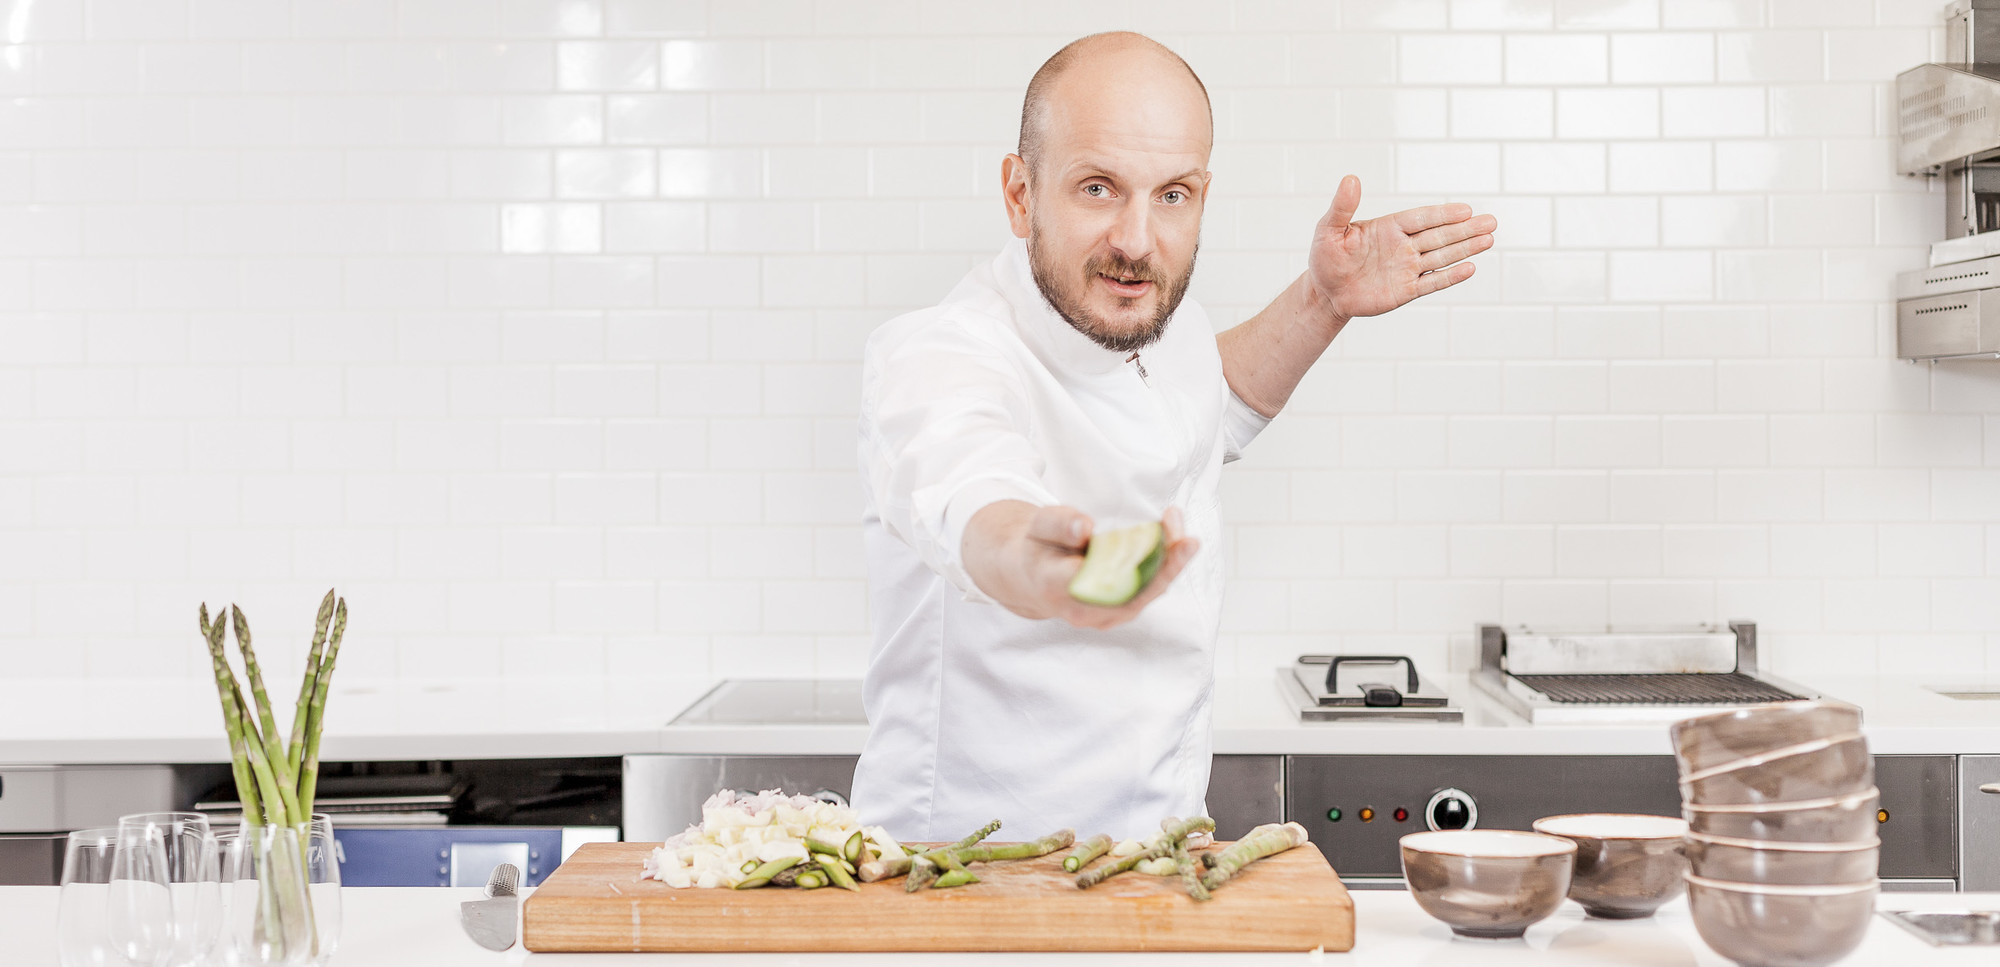 Paras Pizzapohja Hans Välimäki